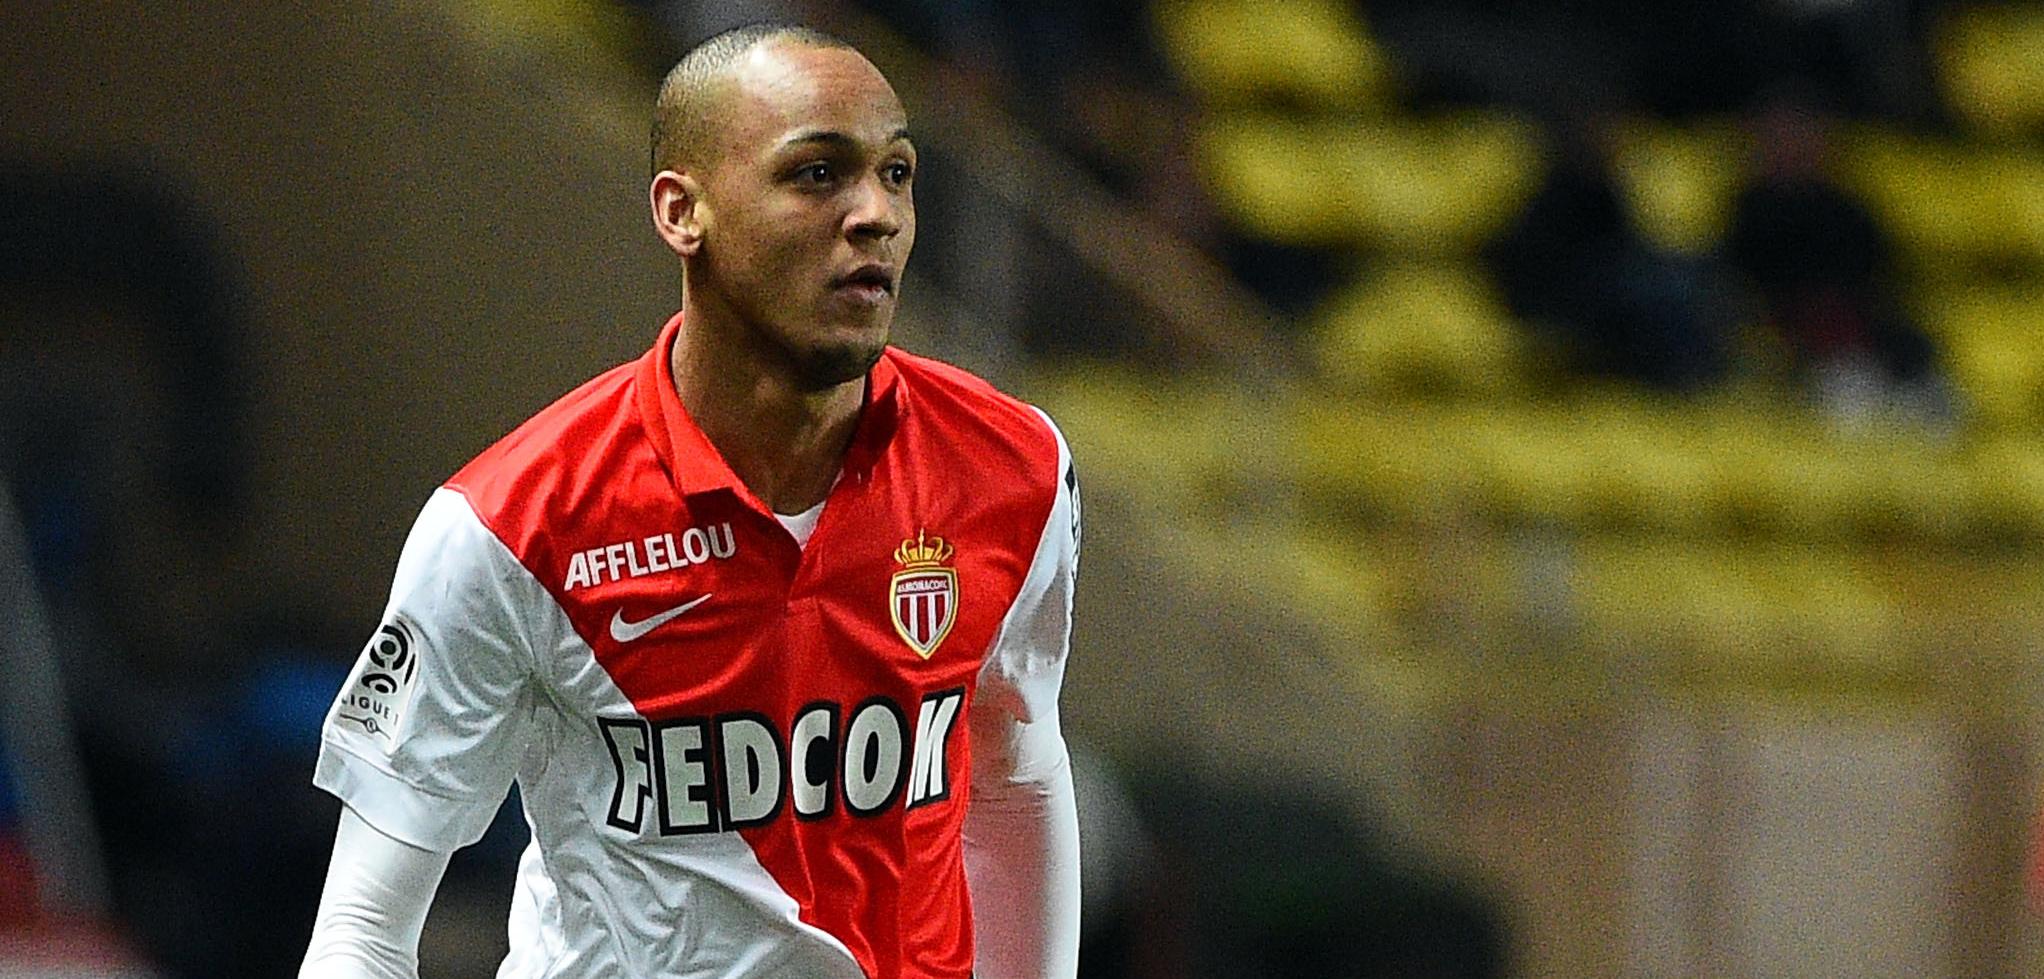 FOOTBALL : Monaco vs Lyon - Ligue 1 - 01/02/2015